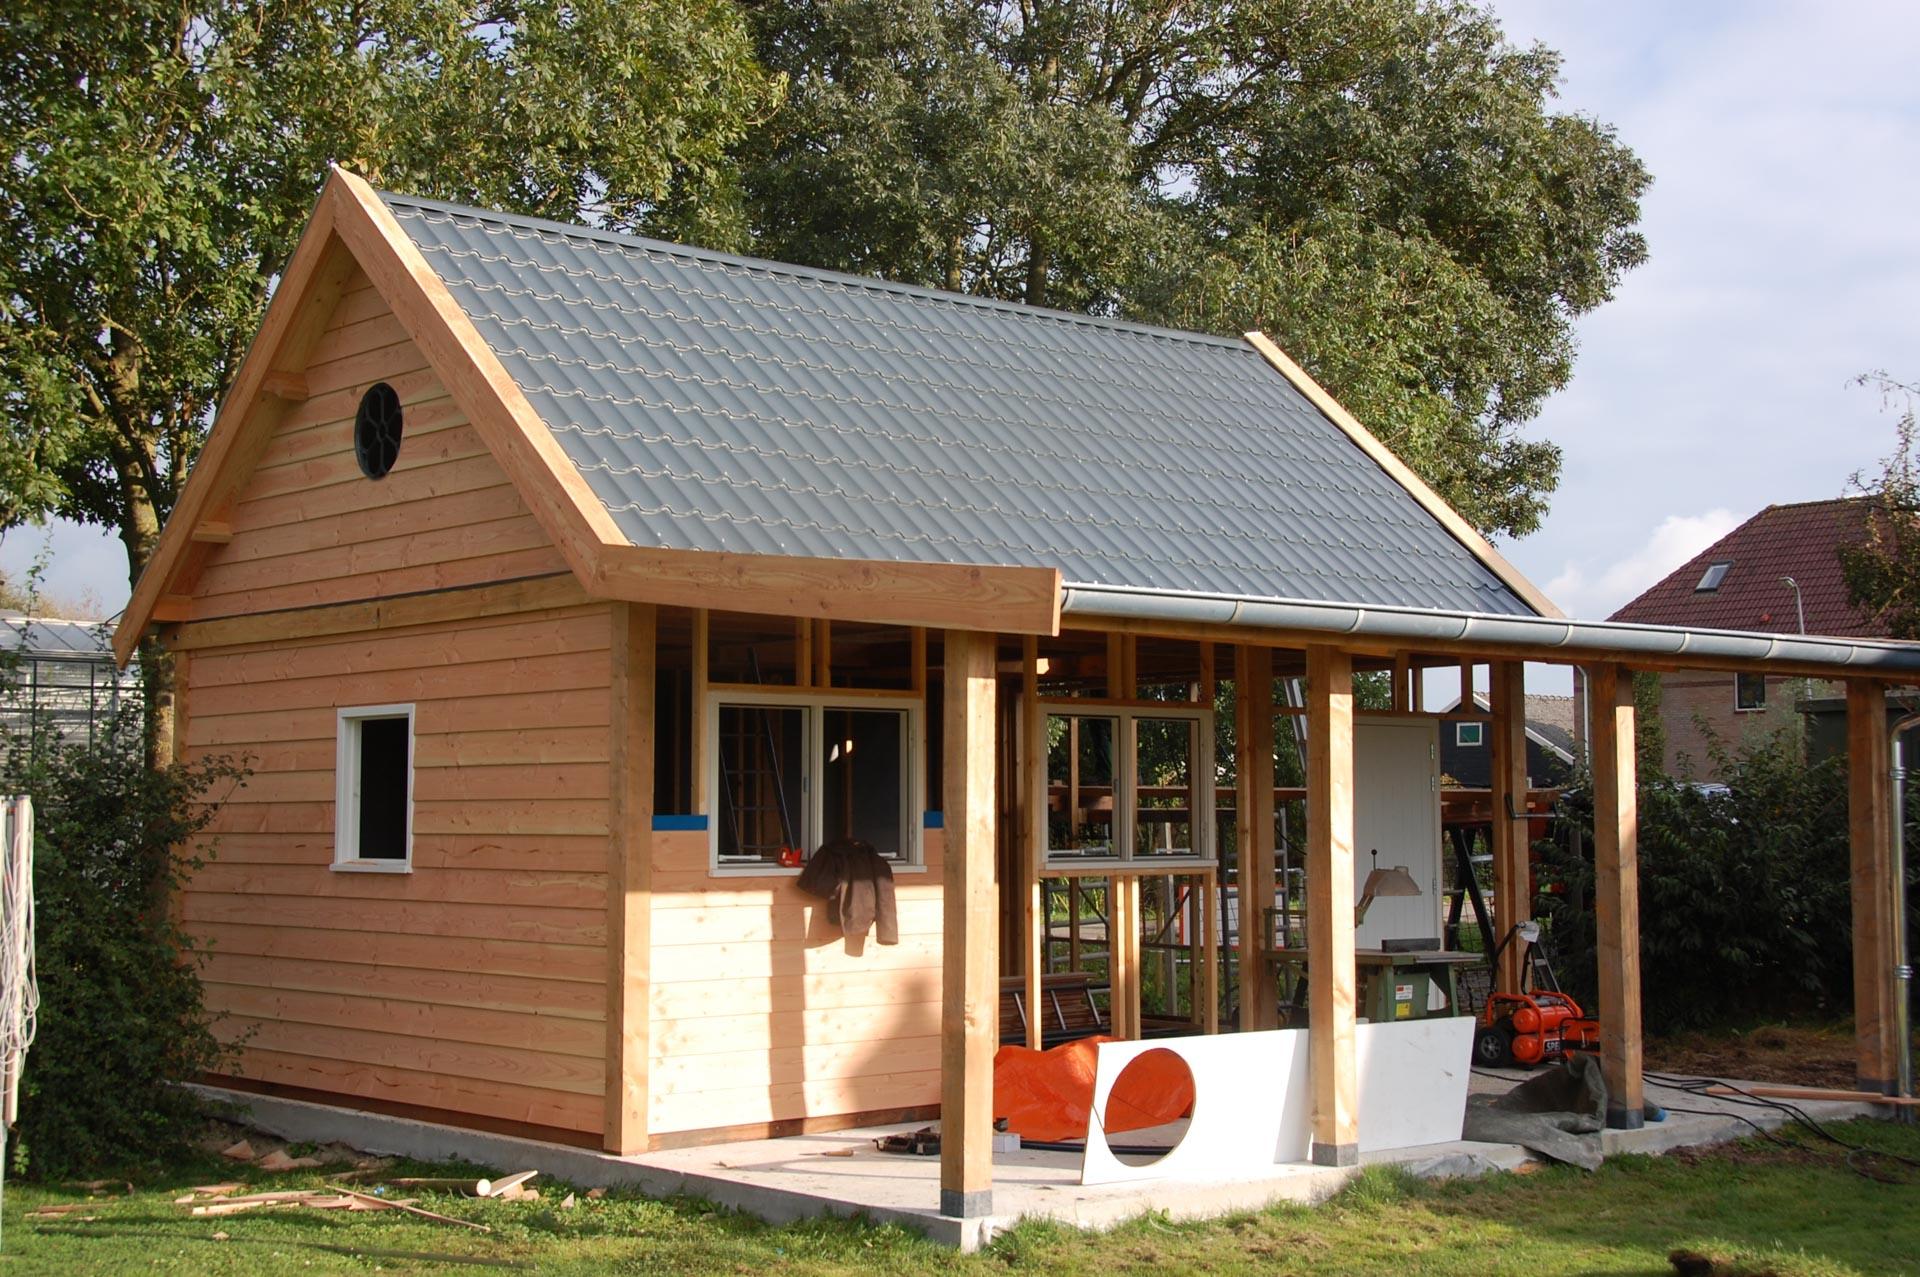 vos-hoveniers-project-tuinhuis-28